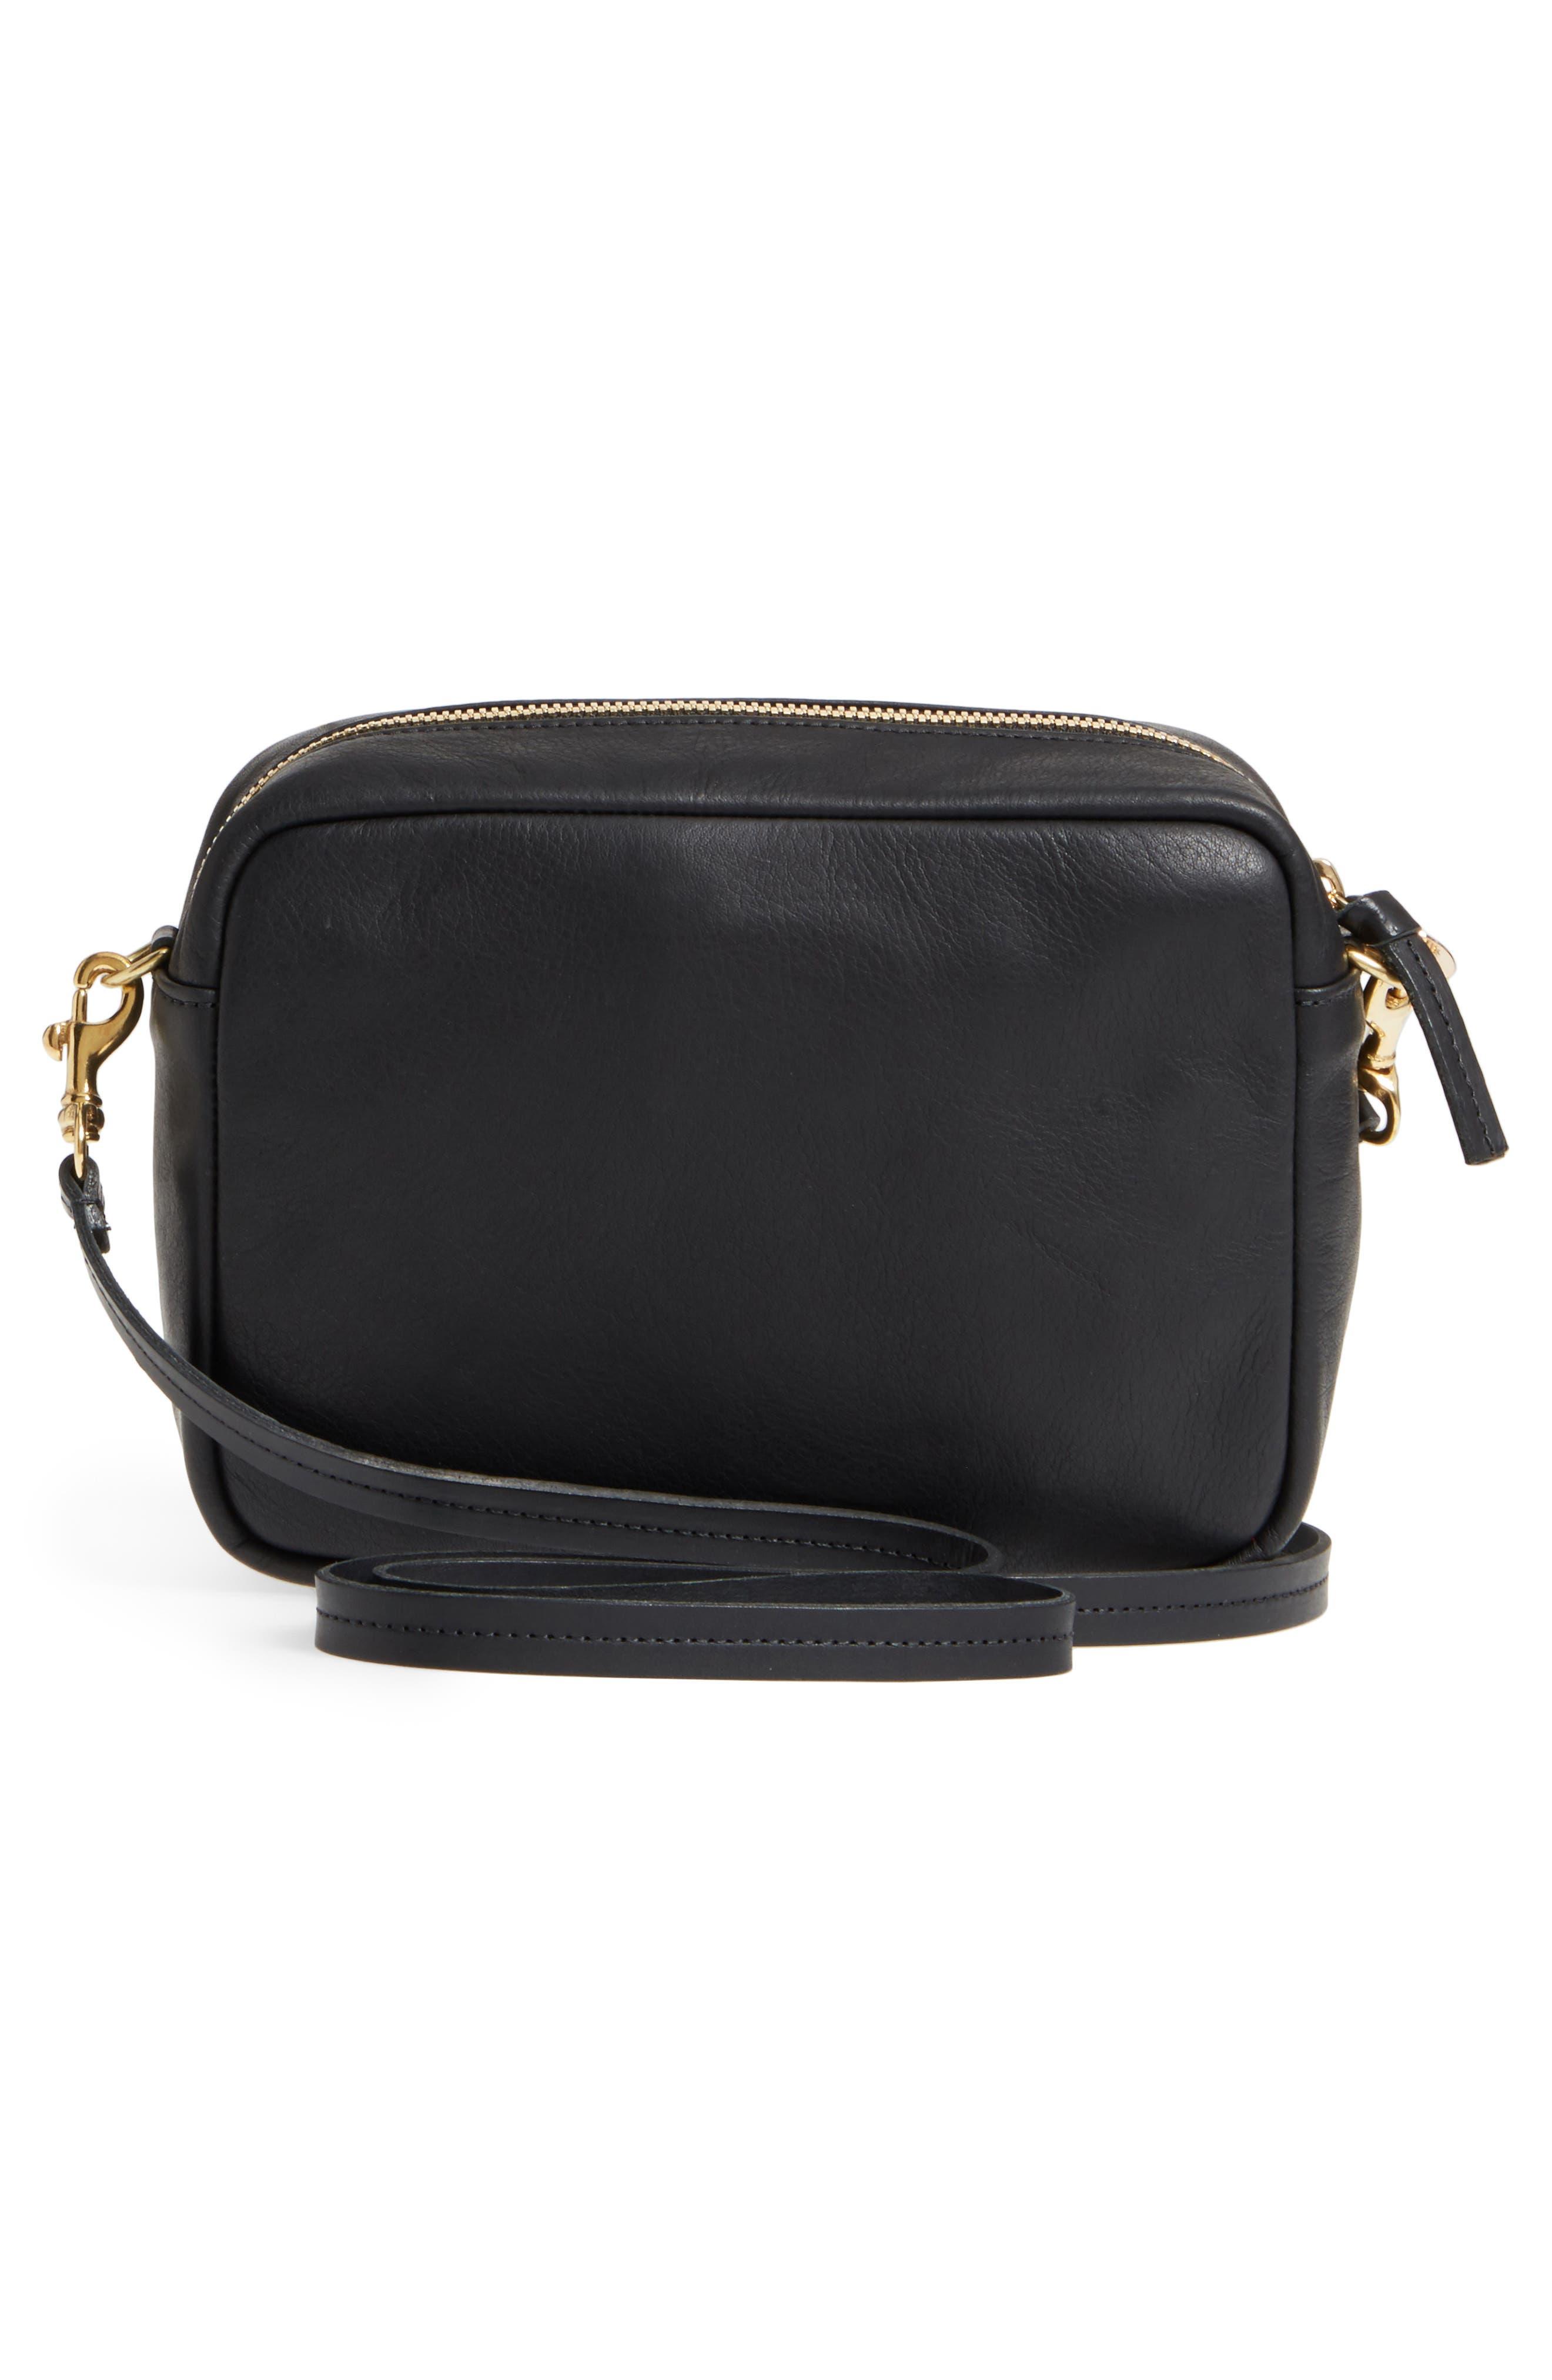 Midi Sac Stripe Leather Crossbody Bag,                             Alternate thumbnail 3, color,                             610